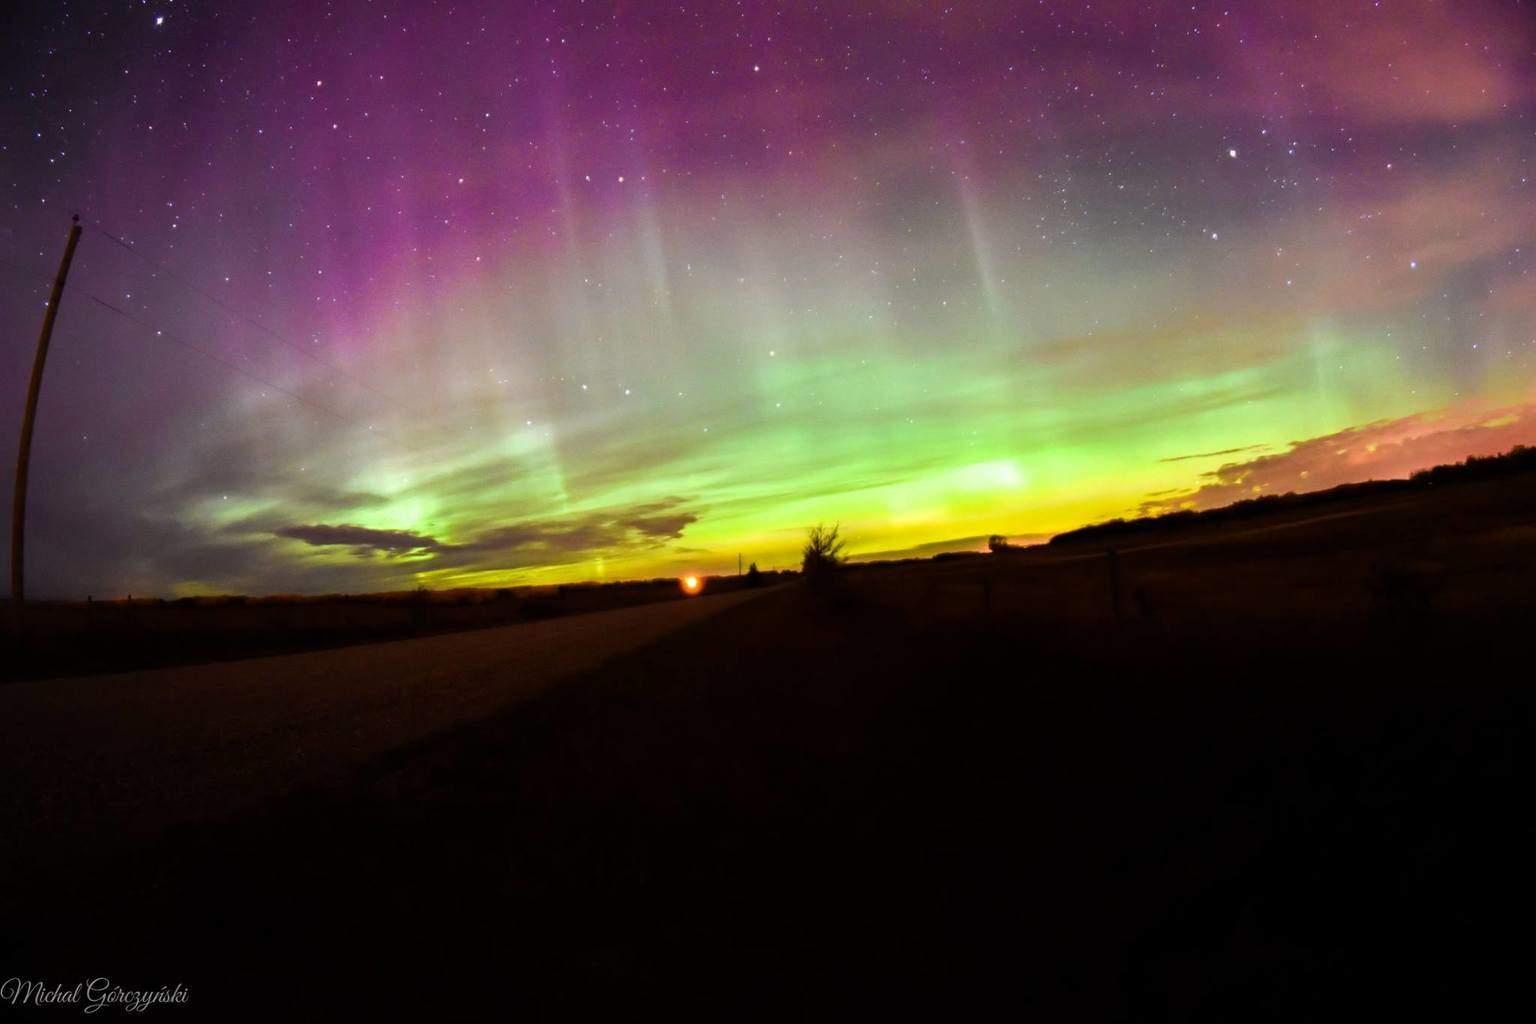 Aurora Borealis from last night. Cochrane AB Canada.